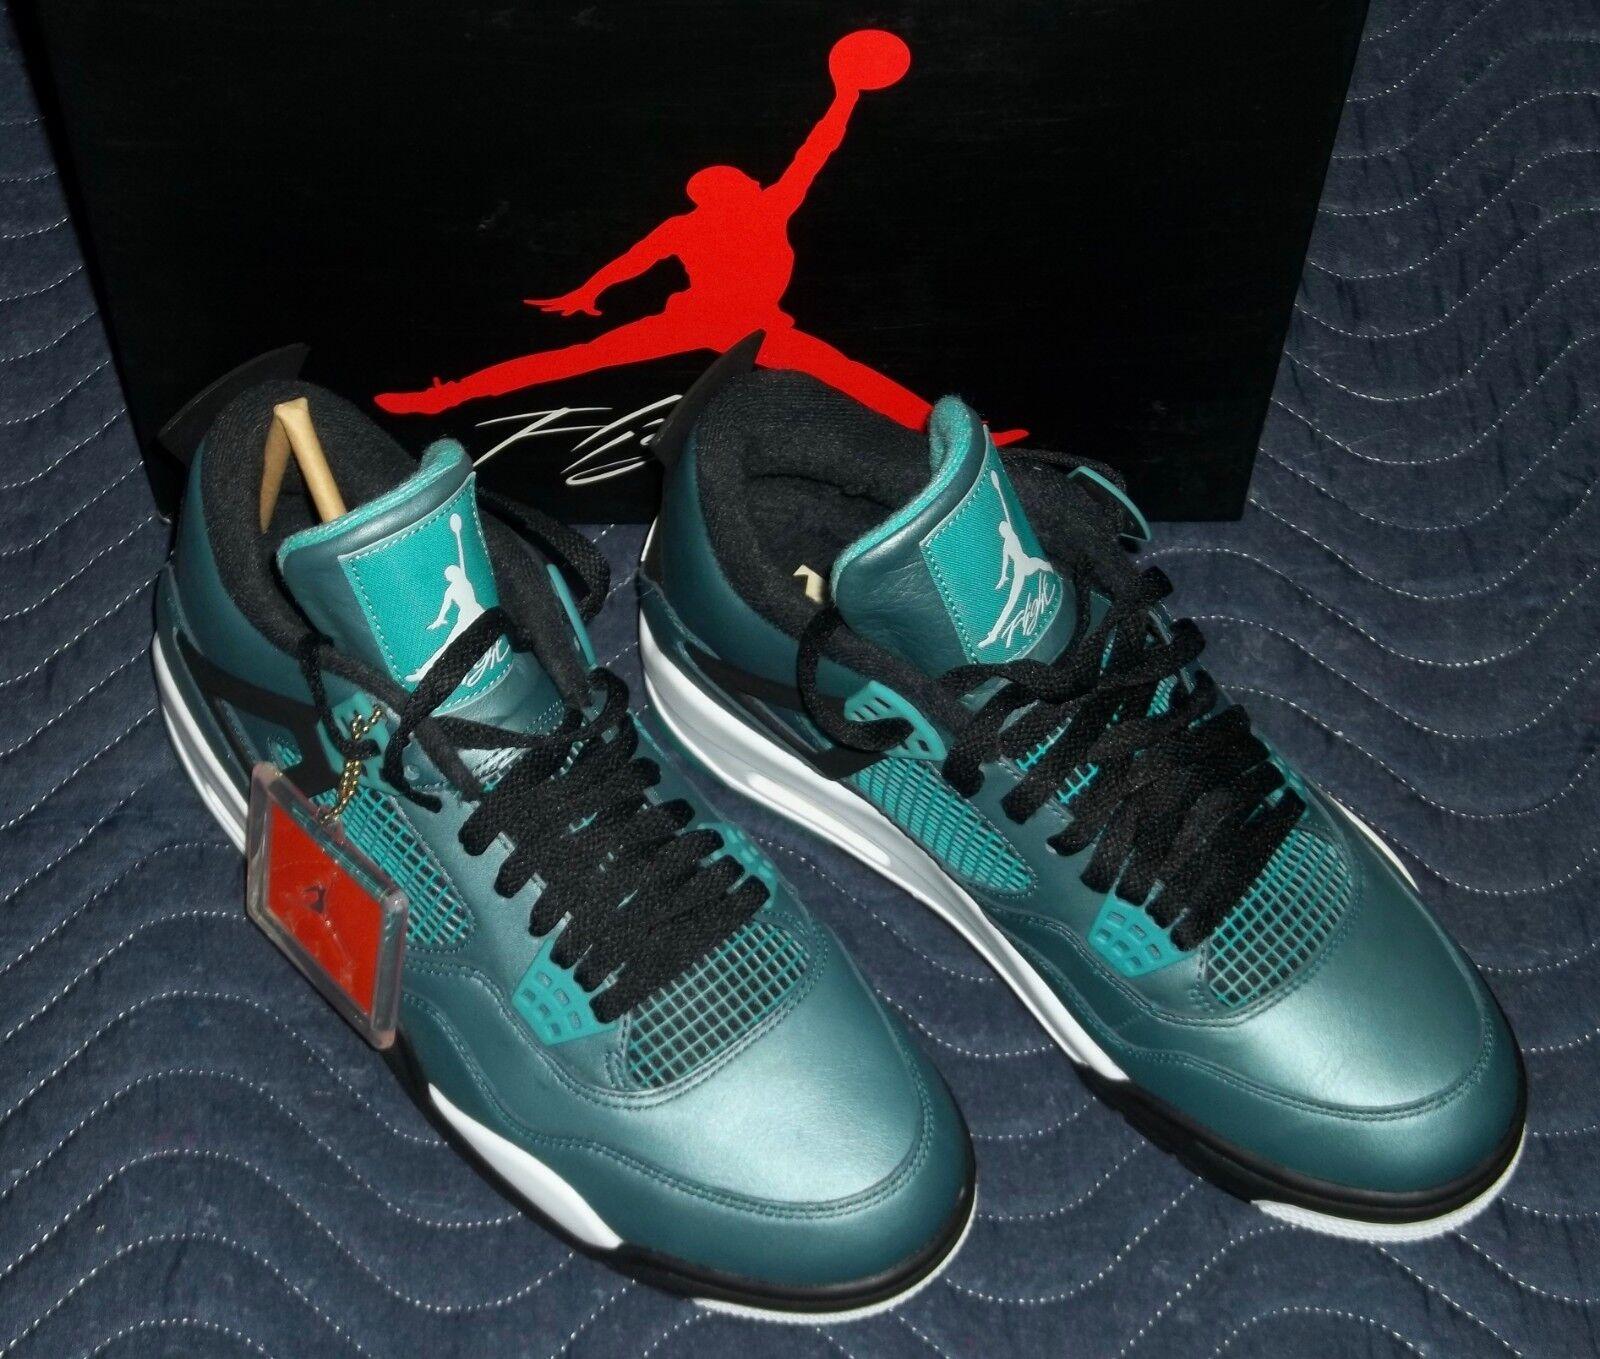 930636c2478 Men's Nike Air Jordan 4 Retro 30th Teal Black White shoes 705331-330 Size  10.5